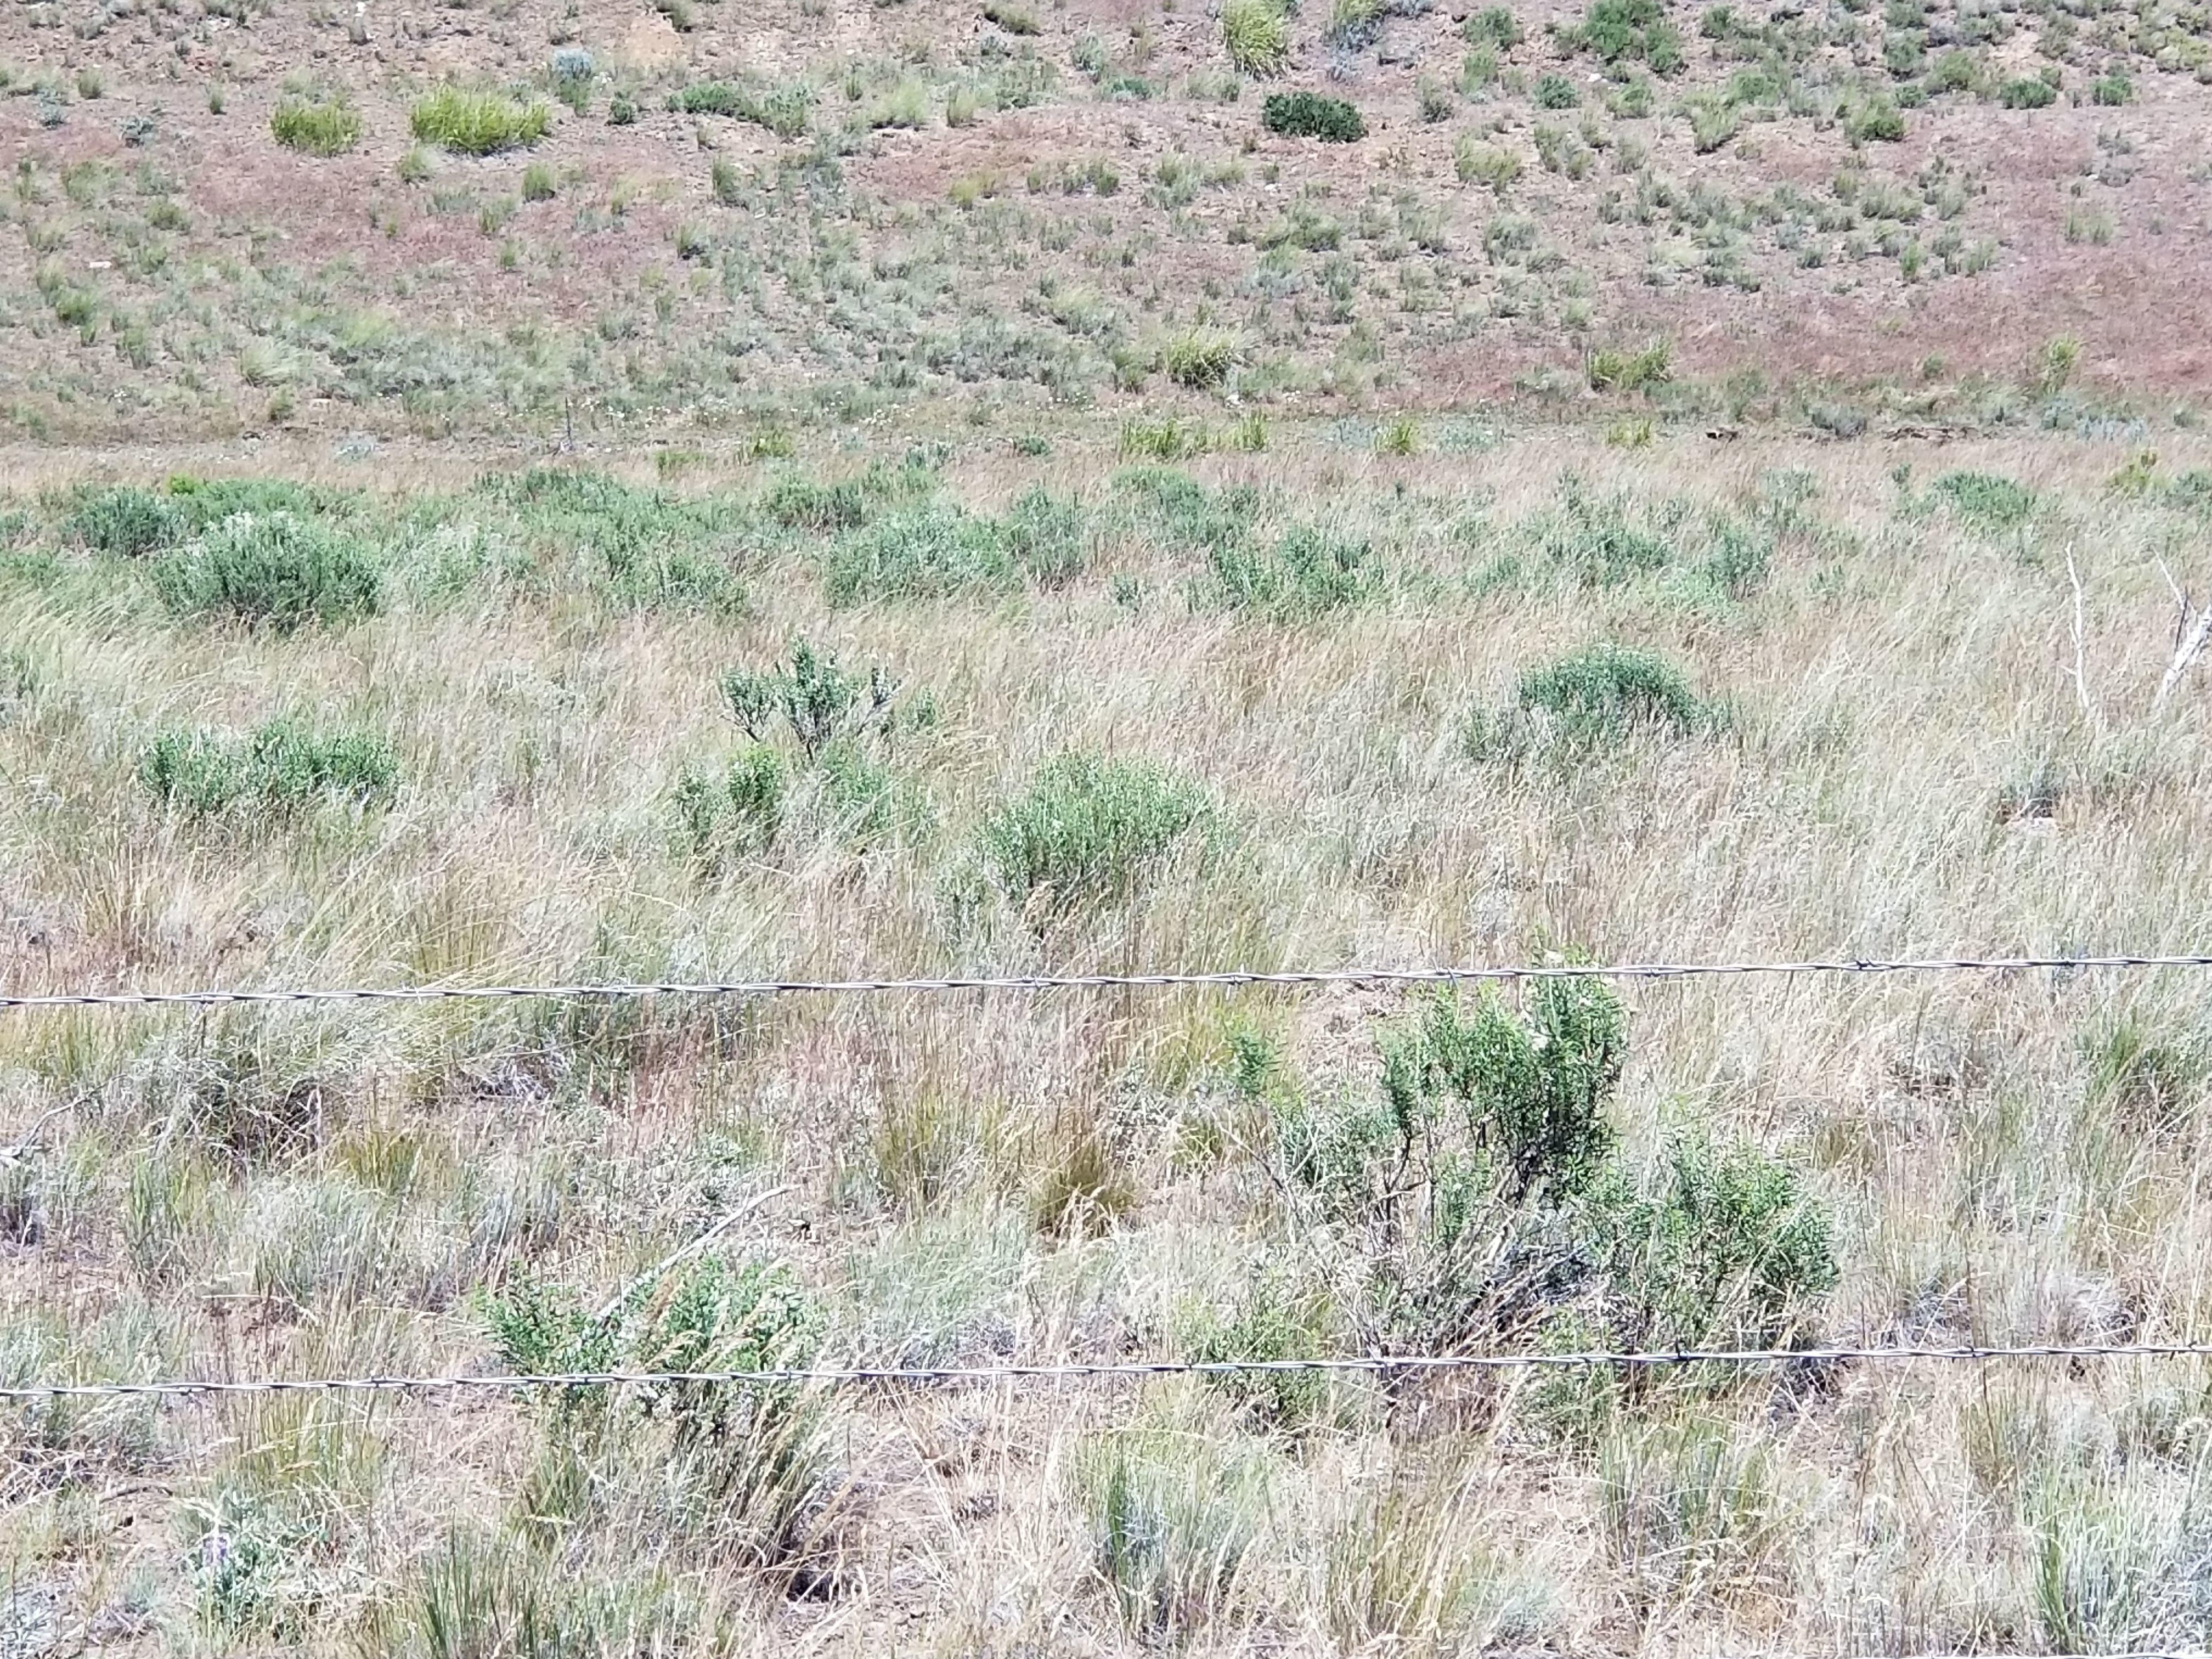 Healthy Native Bluebunch Wheatgrass